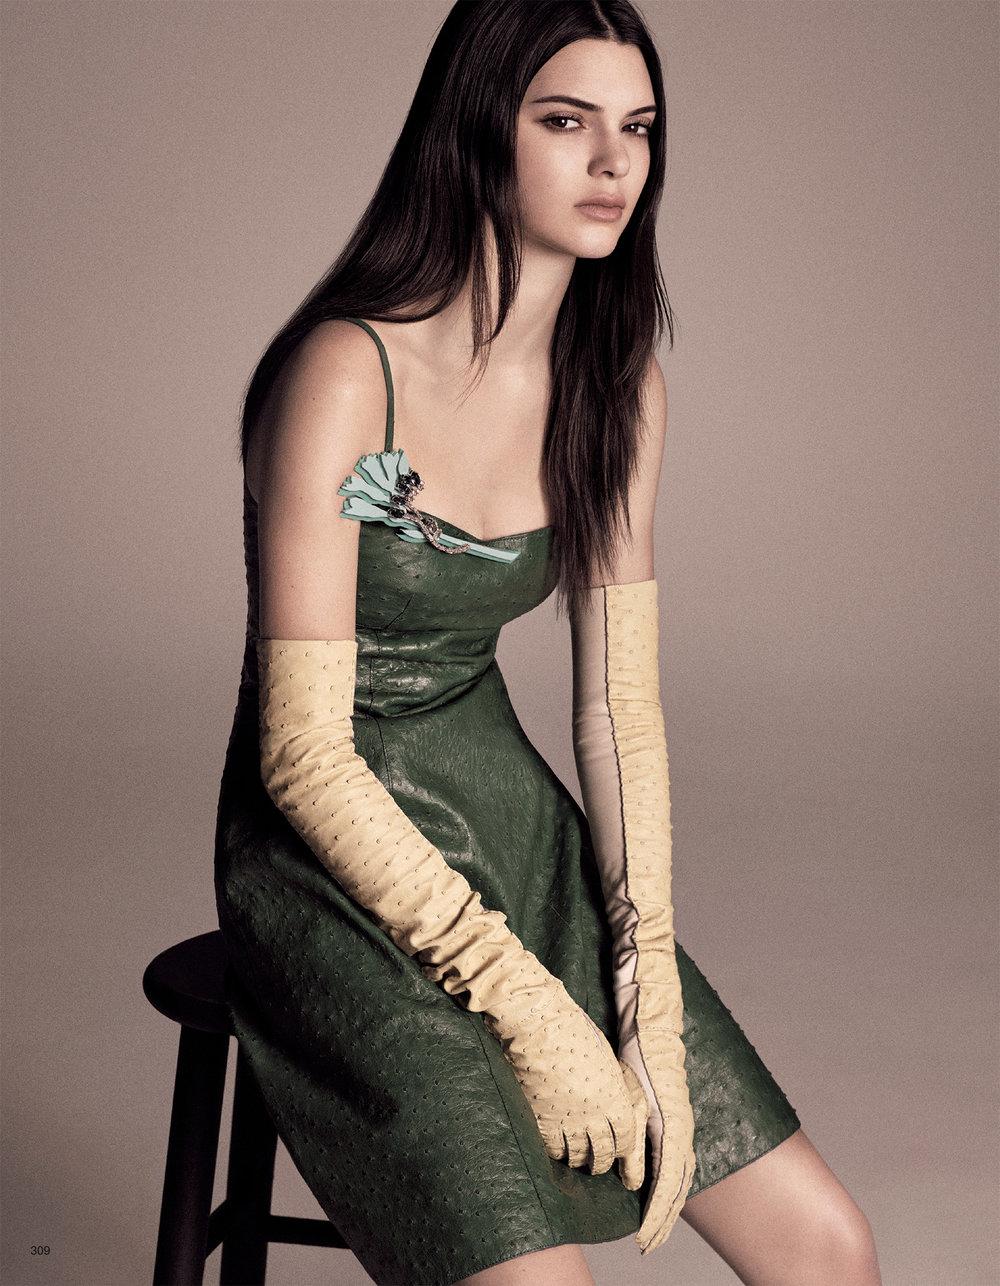 Giovanna-Battaglia-Vogue-Japan-November-2015-Cool-As-Kendall-Patrick-Demarchelier-Kendall-Jenner-5.jpg